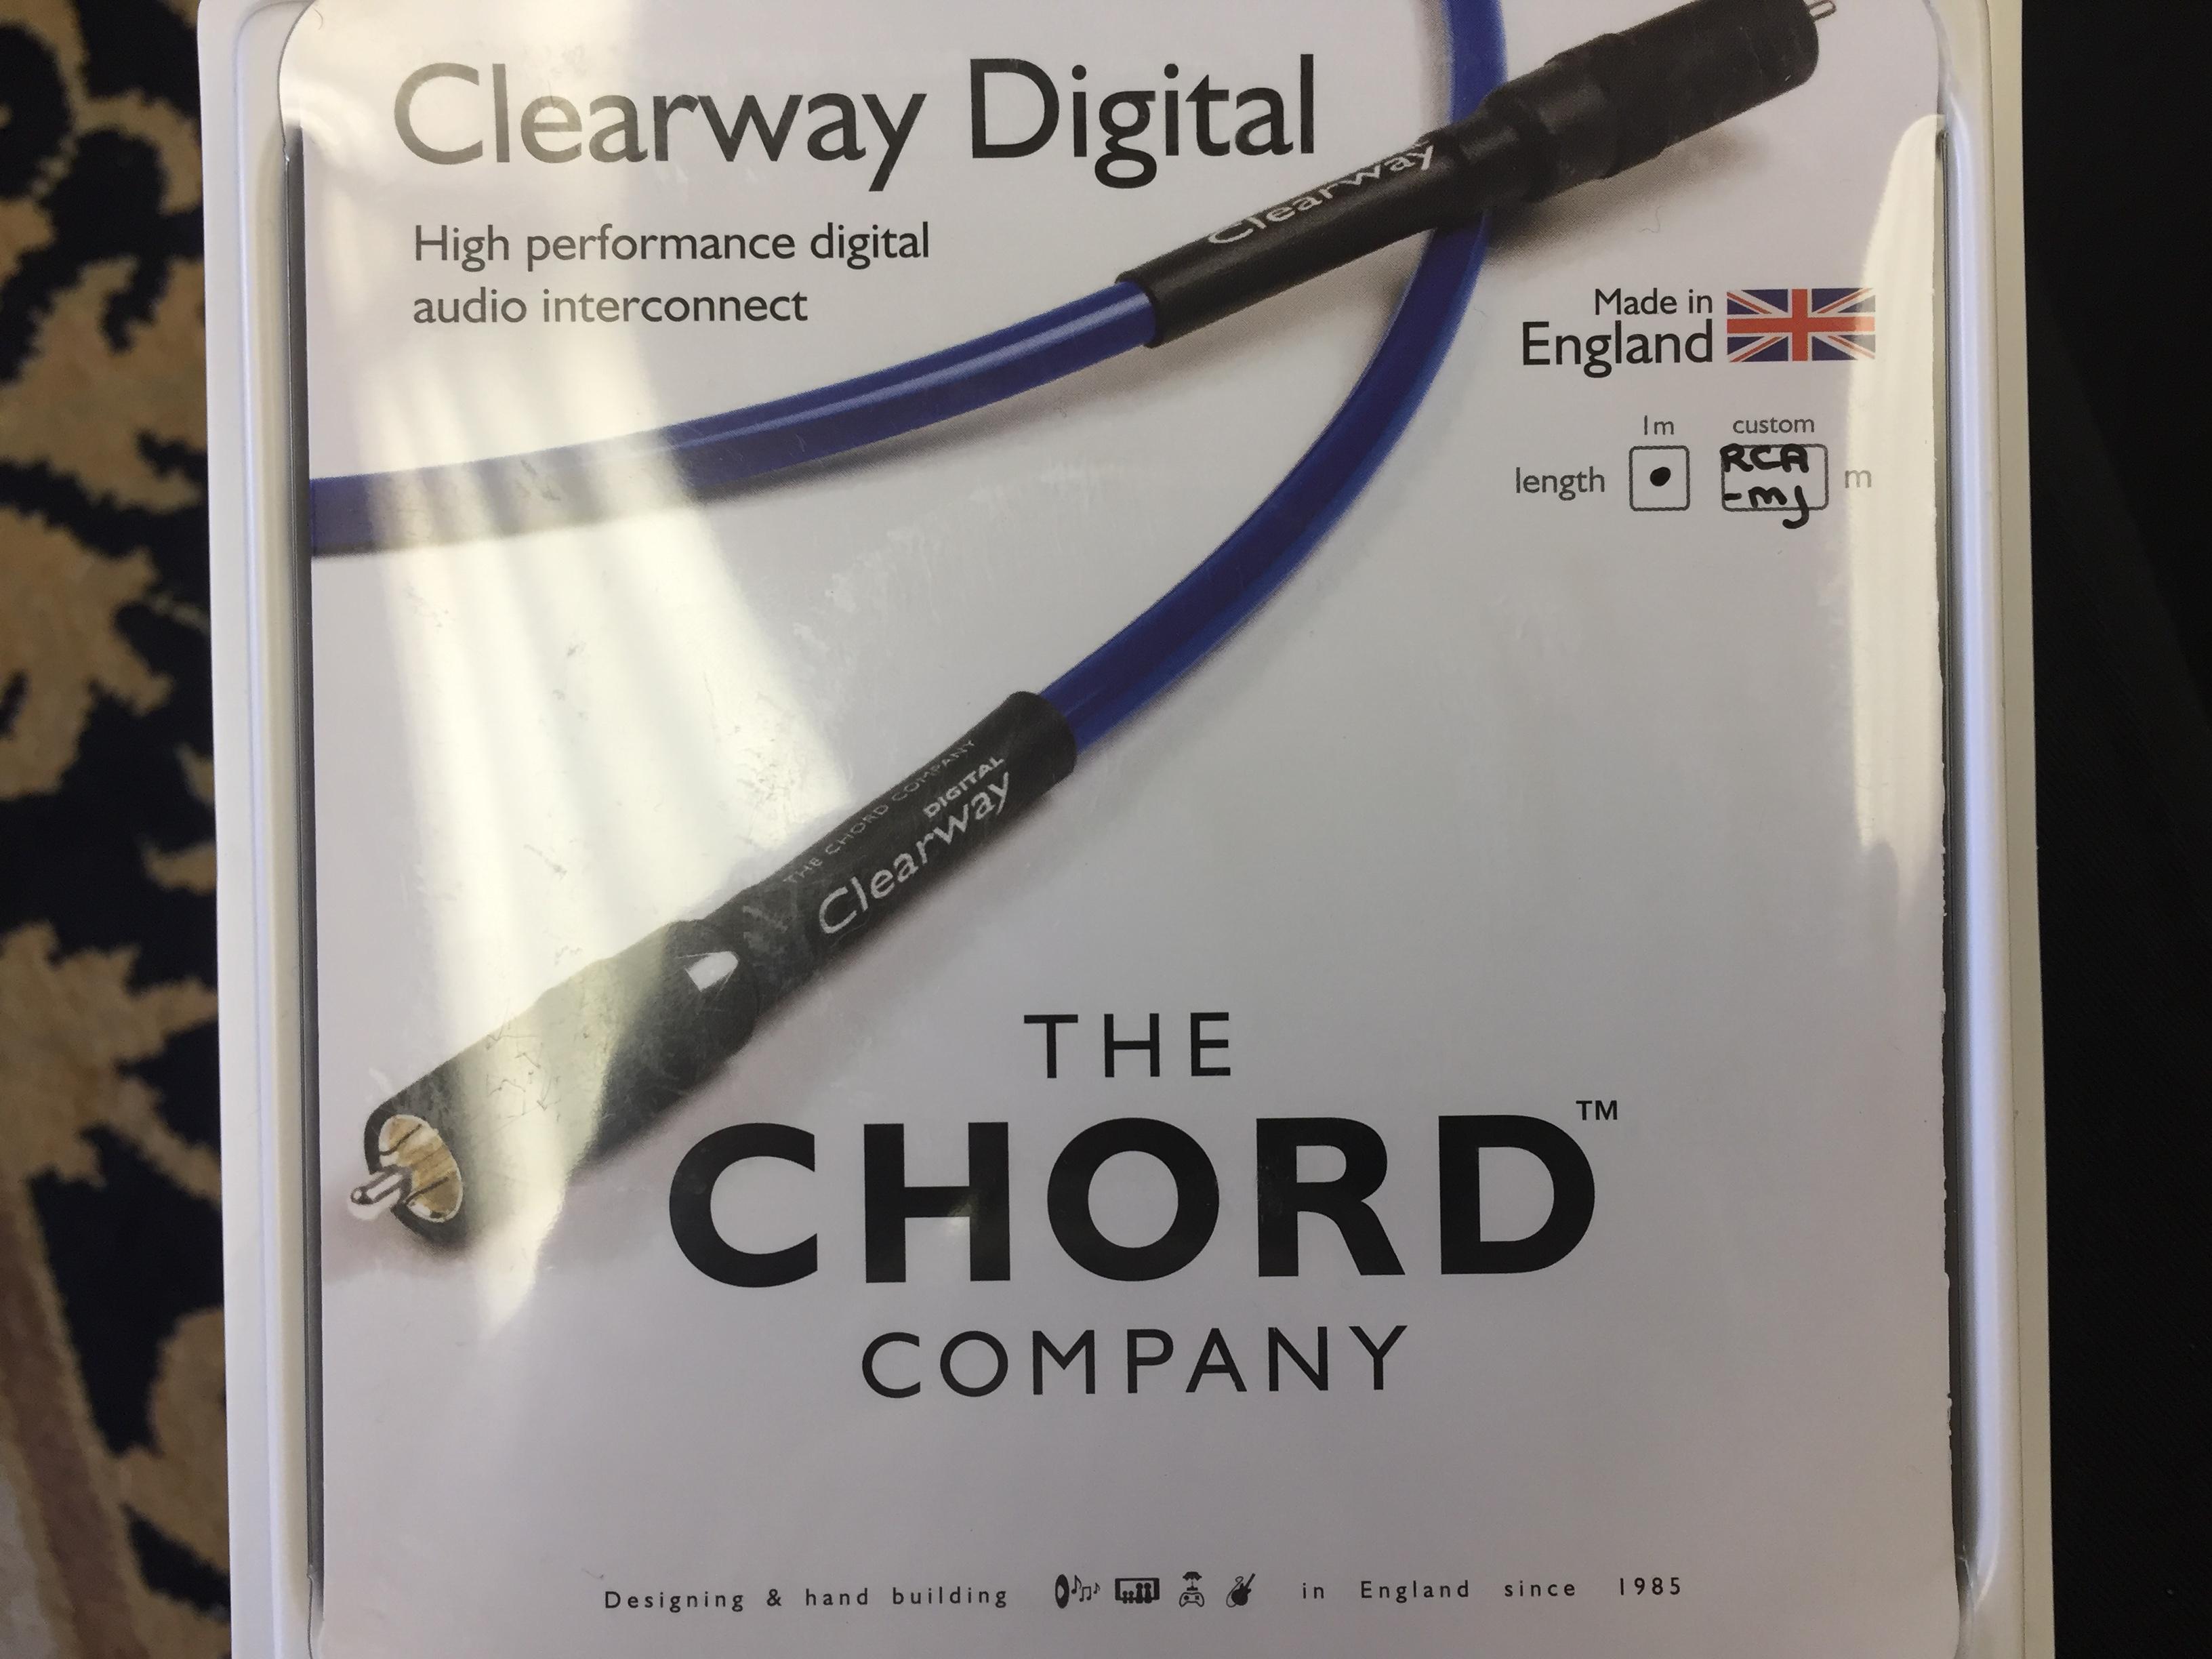 Clearway Digital